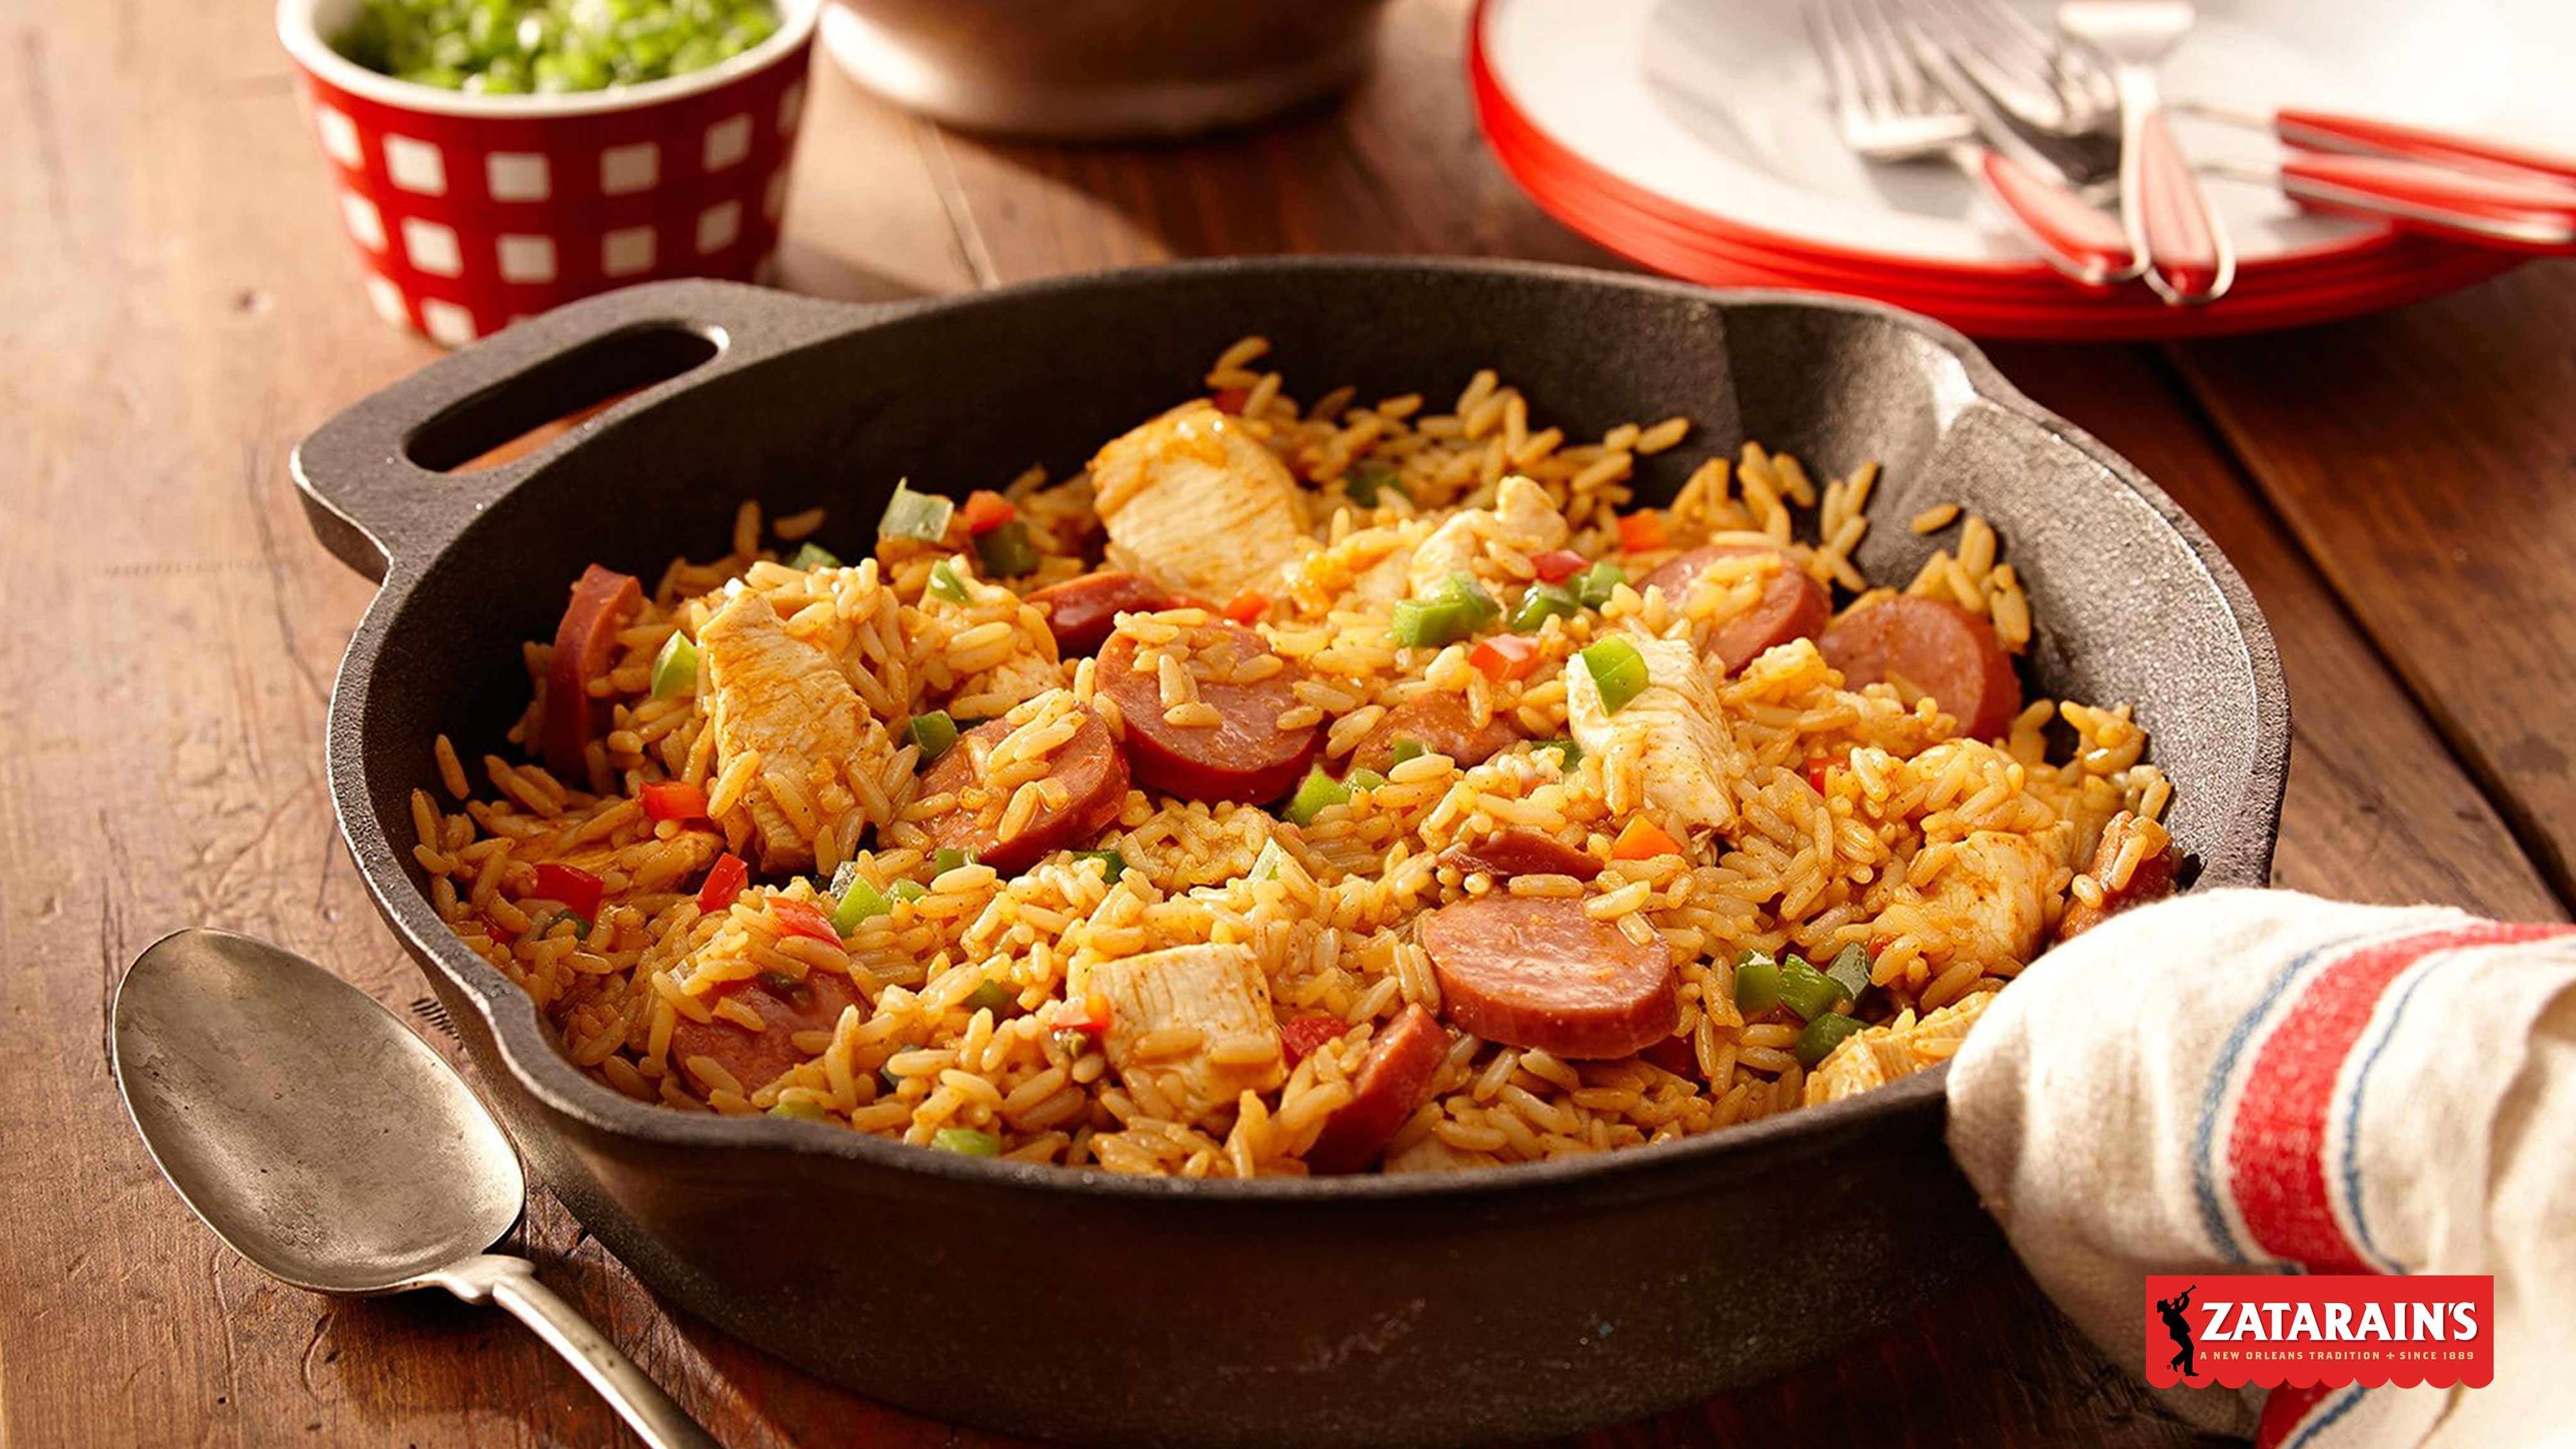 Image for Recipe Feed Your Krewe Jambalaya